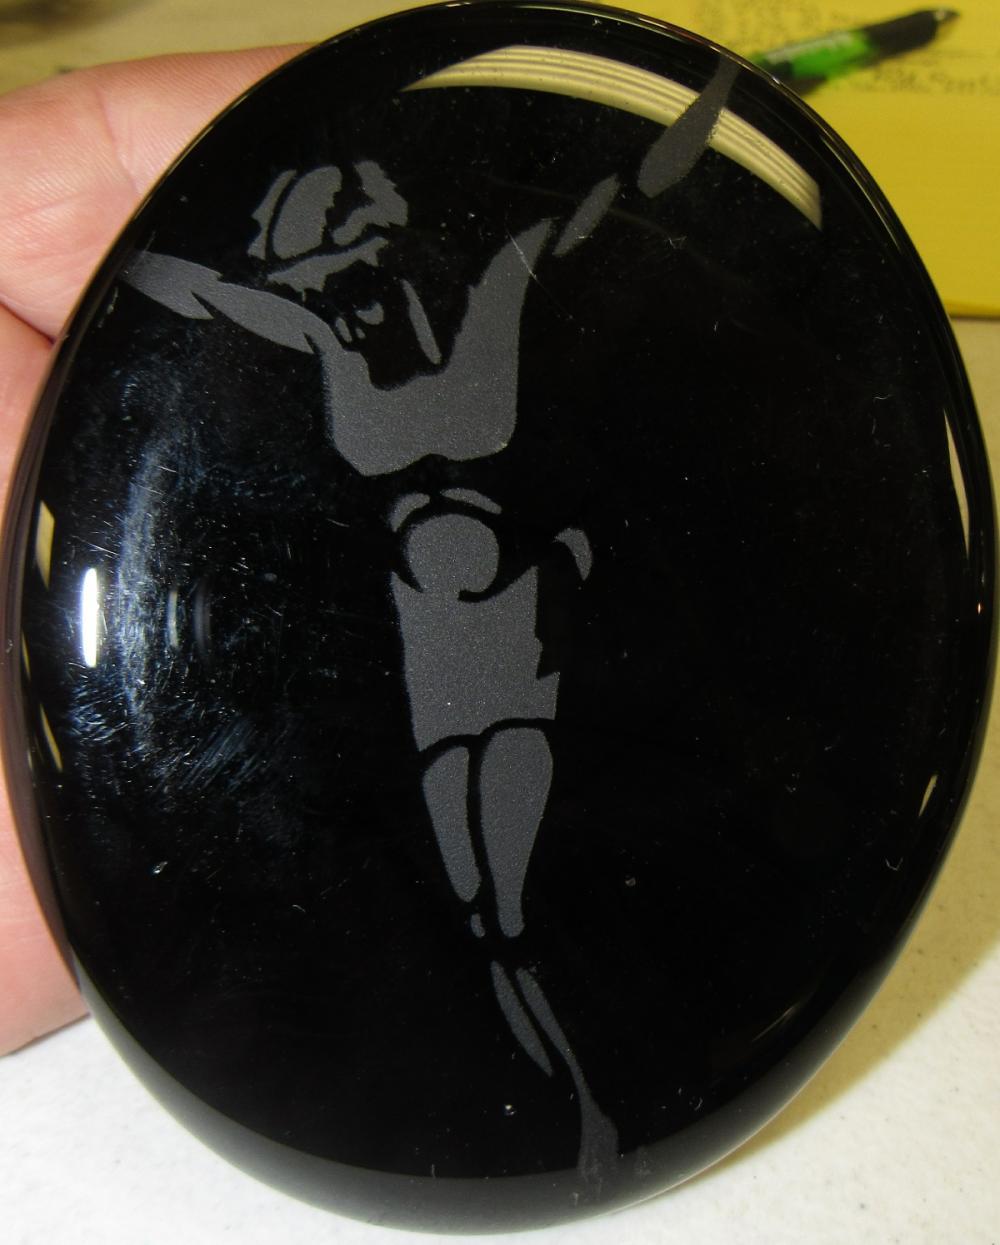 "Vintage Etched Disc Paperweight, Black, 3 3/4"" x 4 3/4"", EC"